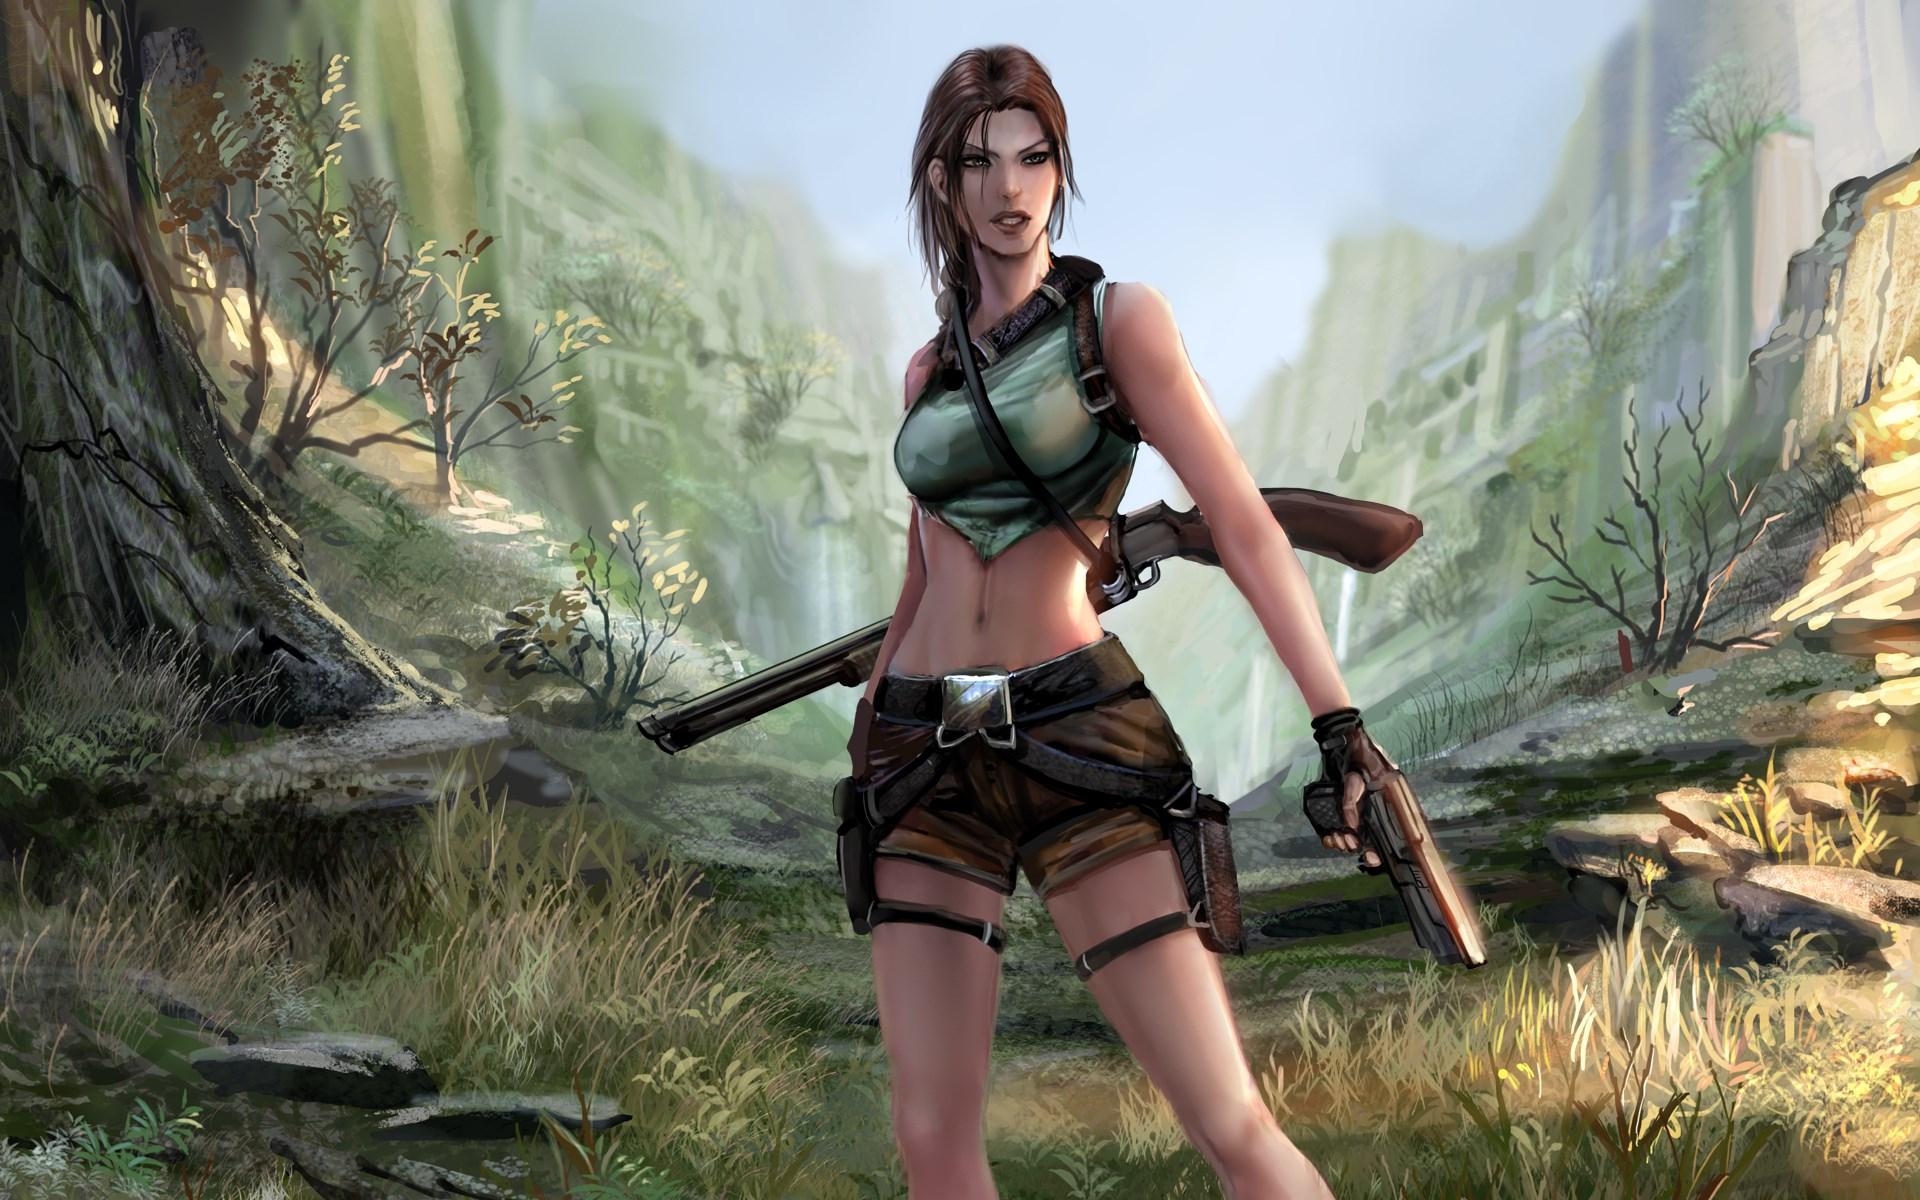 Wallpaperswide Rise Of The Tomb Raider Lara Croft Hd Desktop